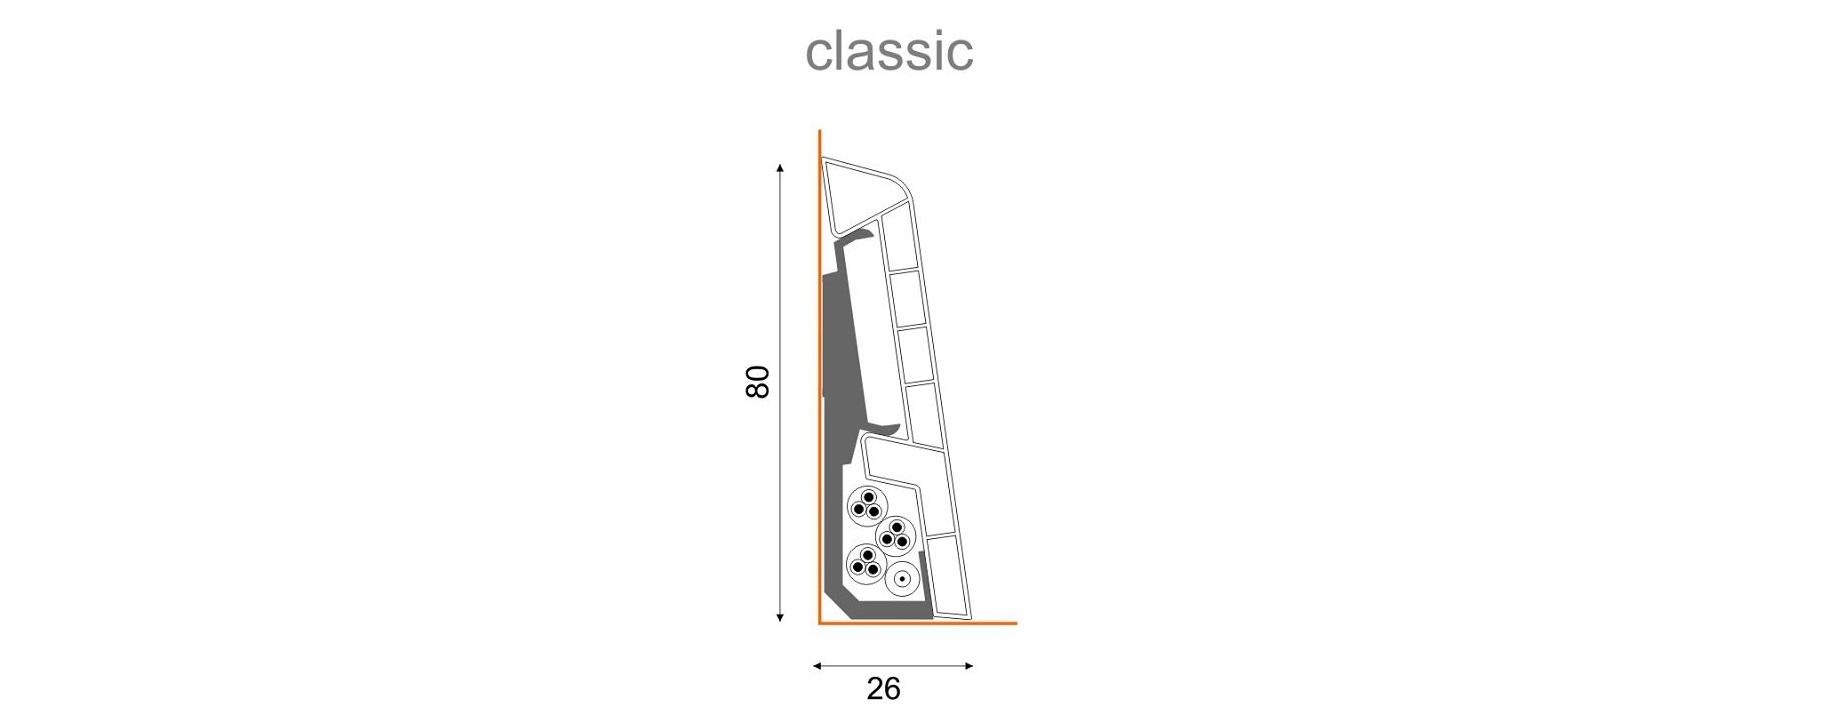 wymiary classic_1.JPG